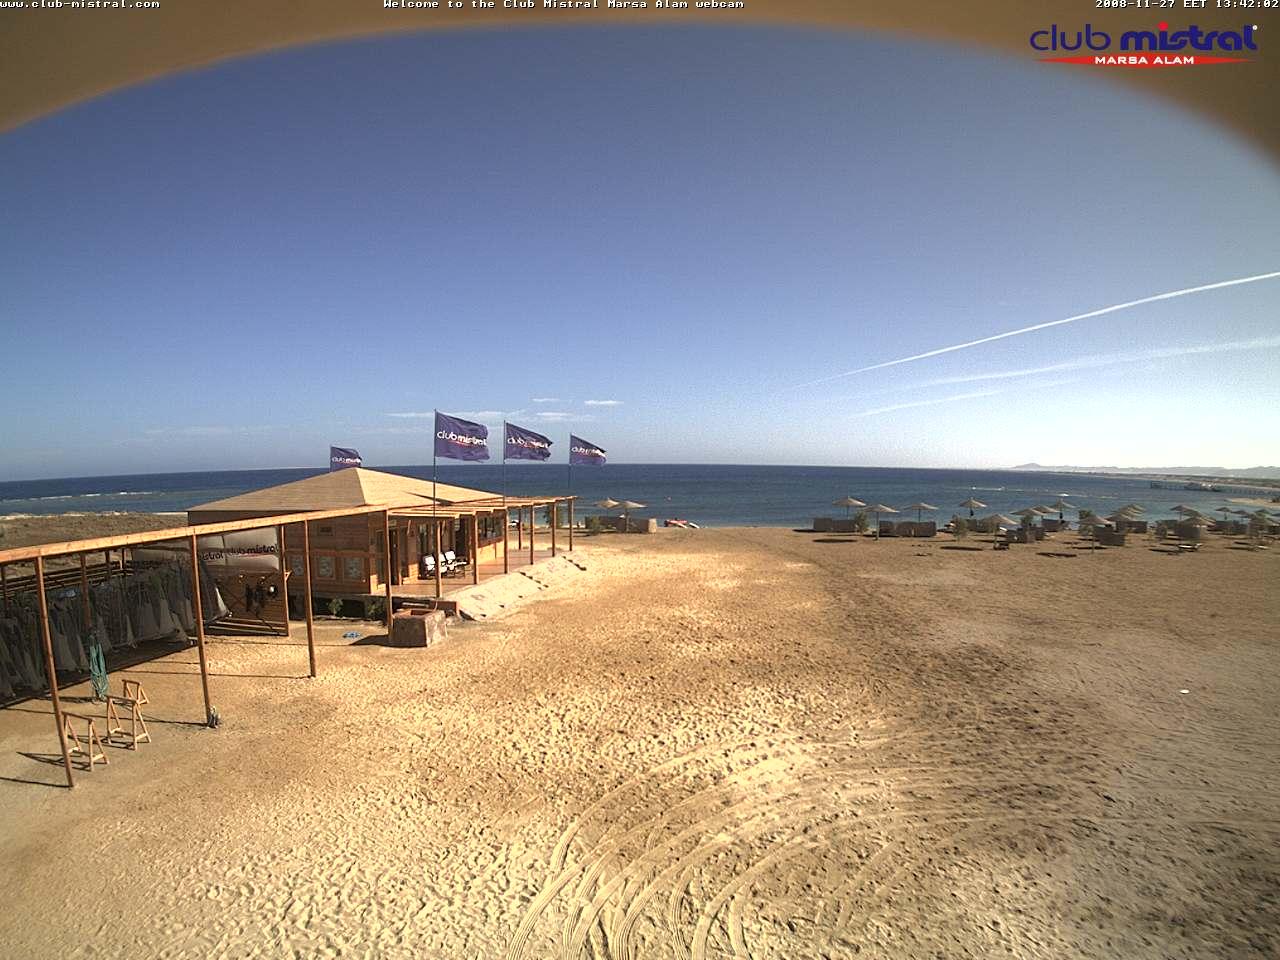 Beach of Marsa Alam photo 6